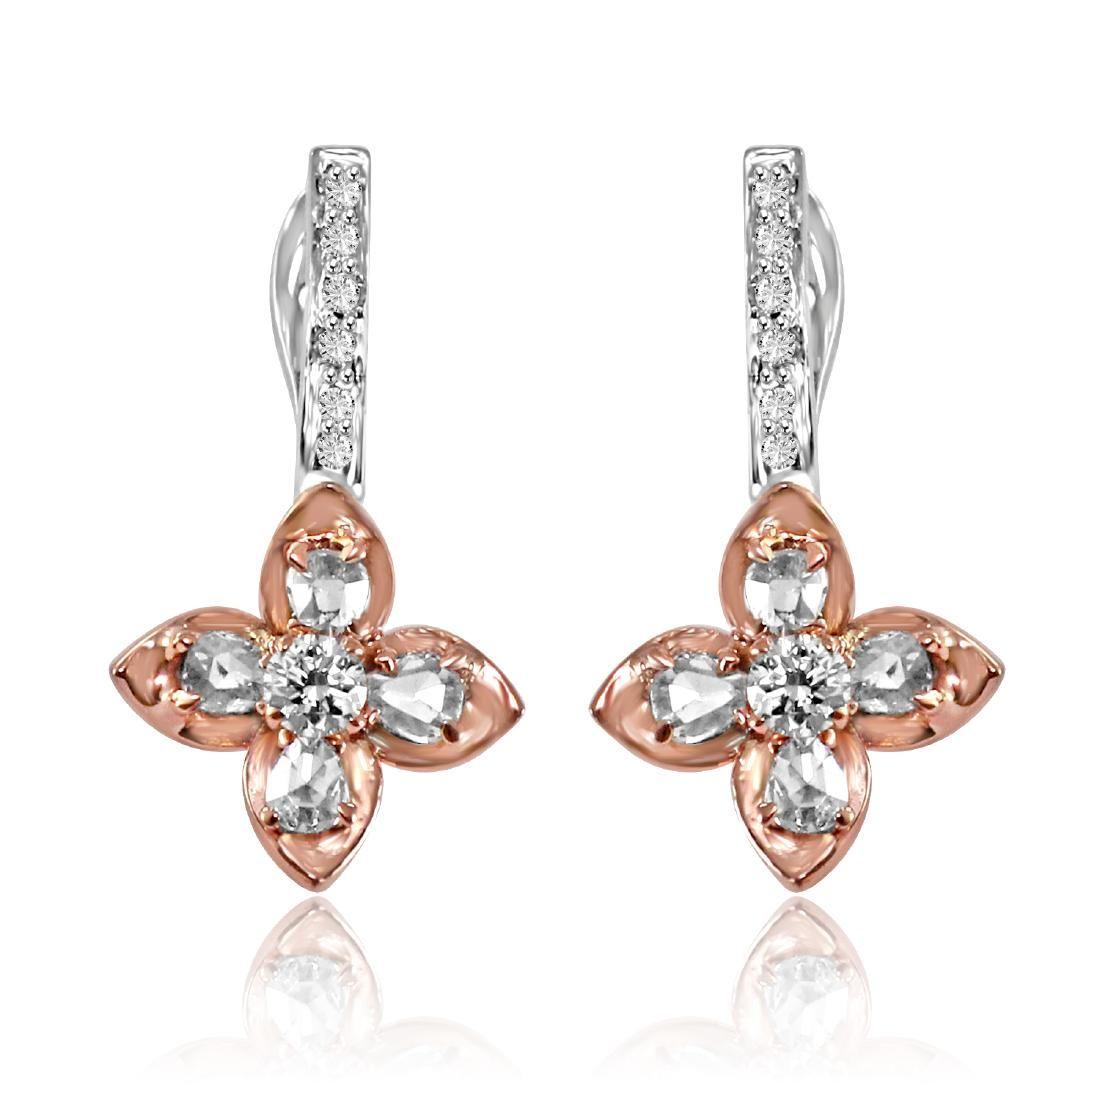 18K Gold Rosecut Diamond Floral Earrings